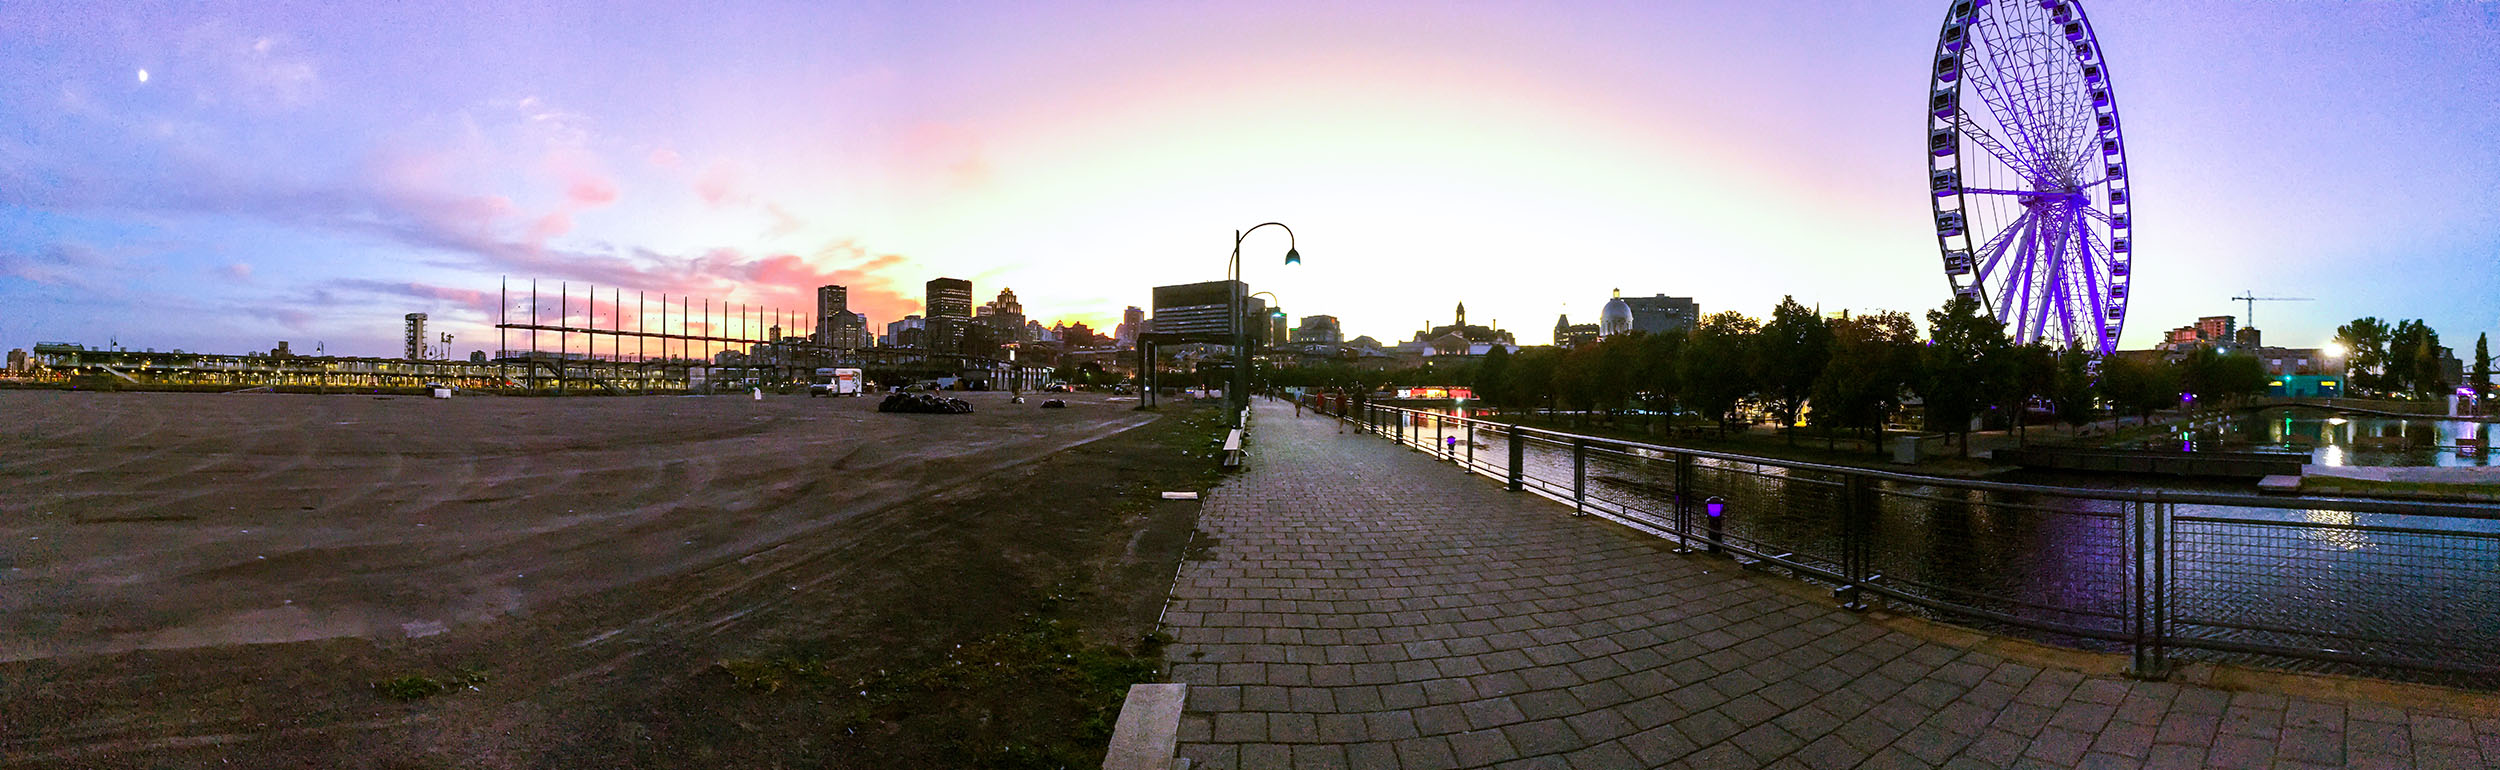 boardwalk_sunset.jpg